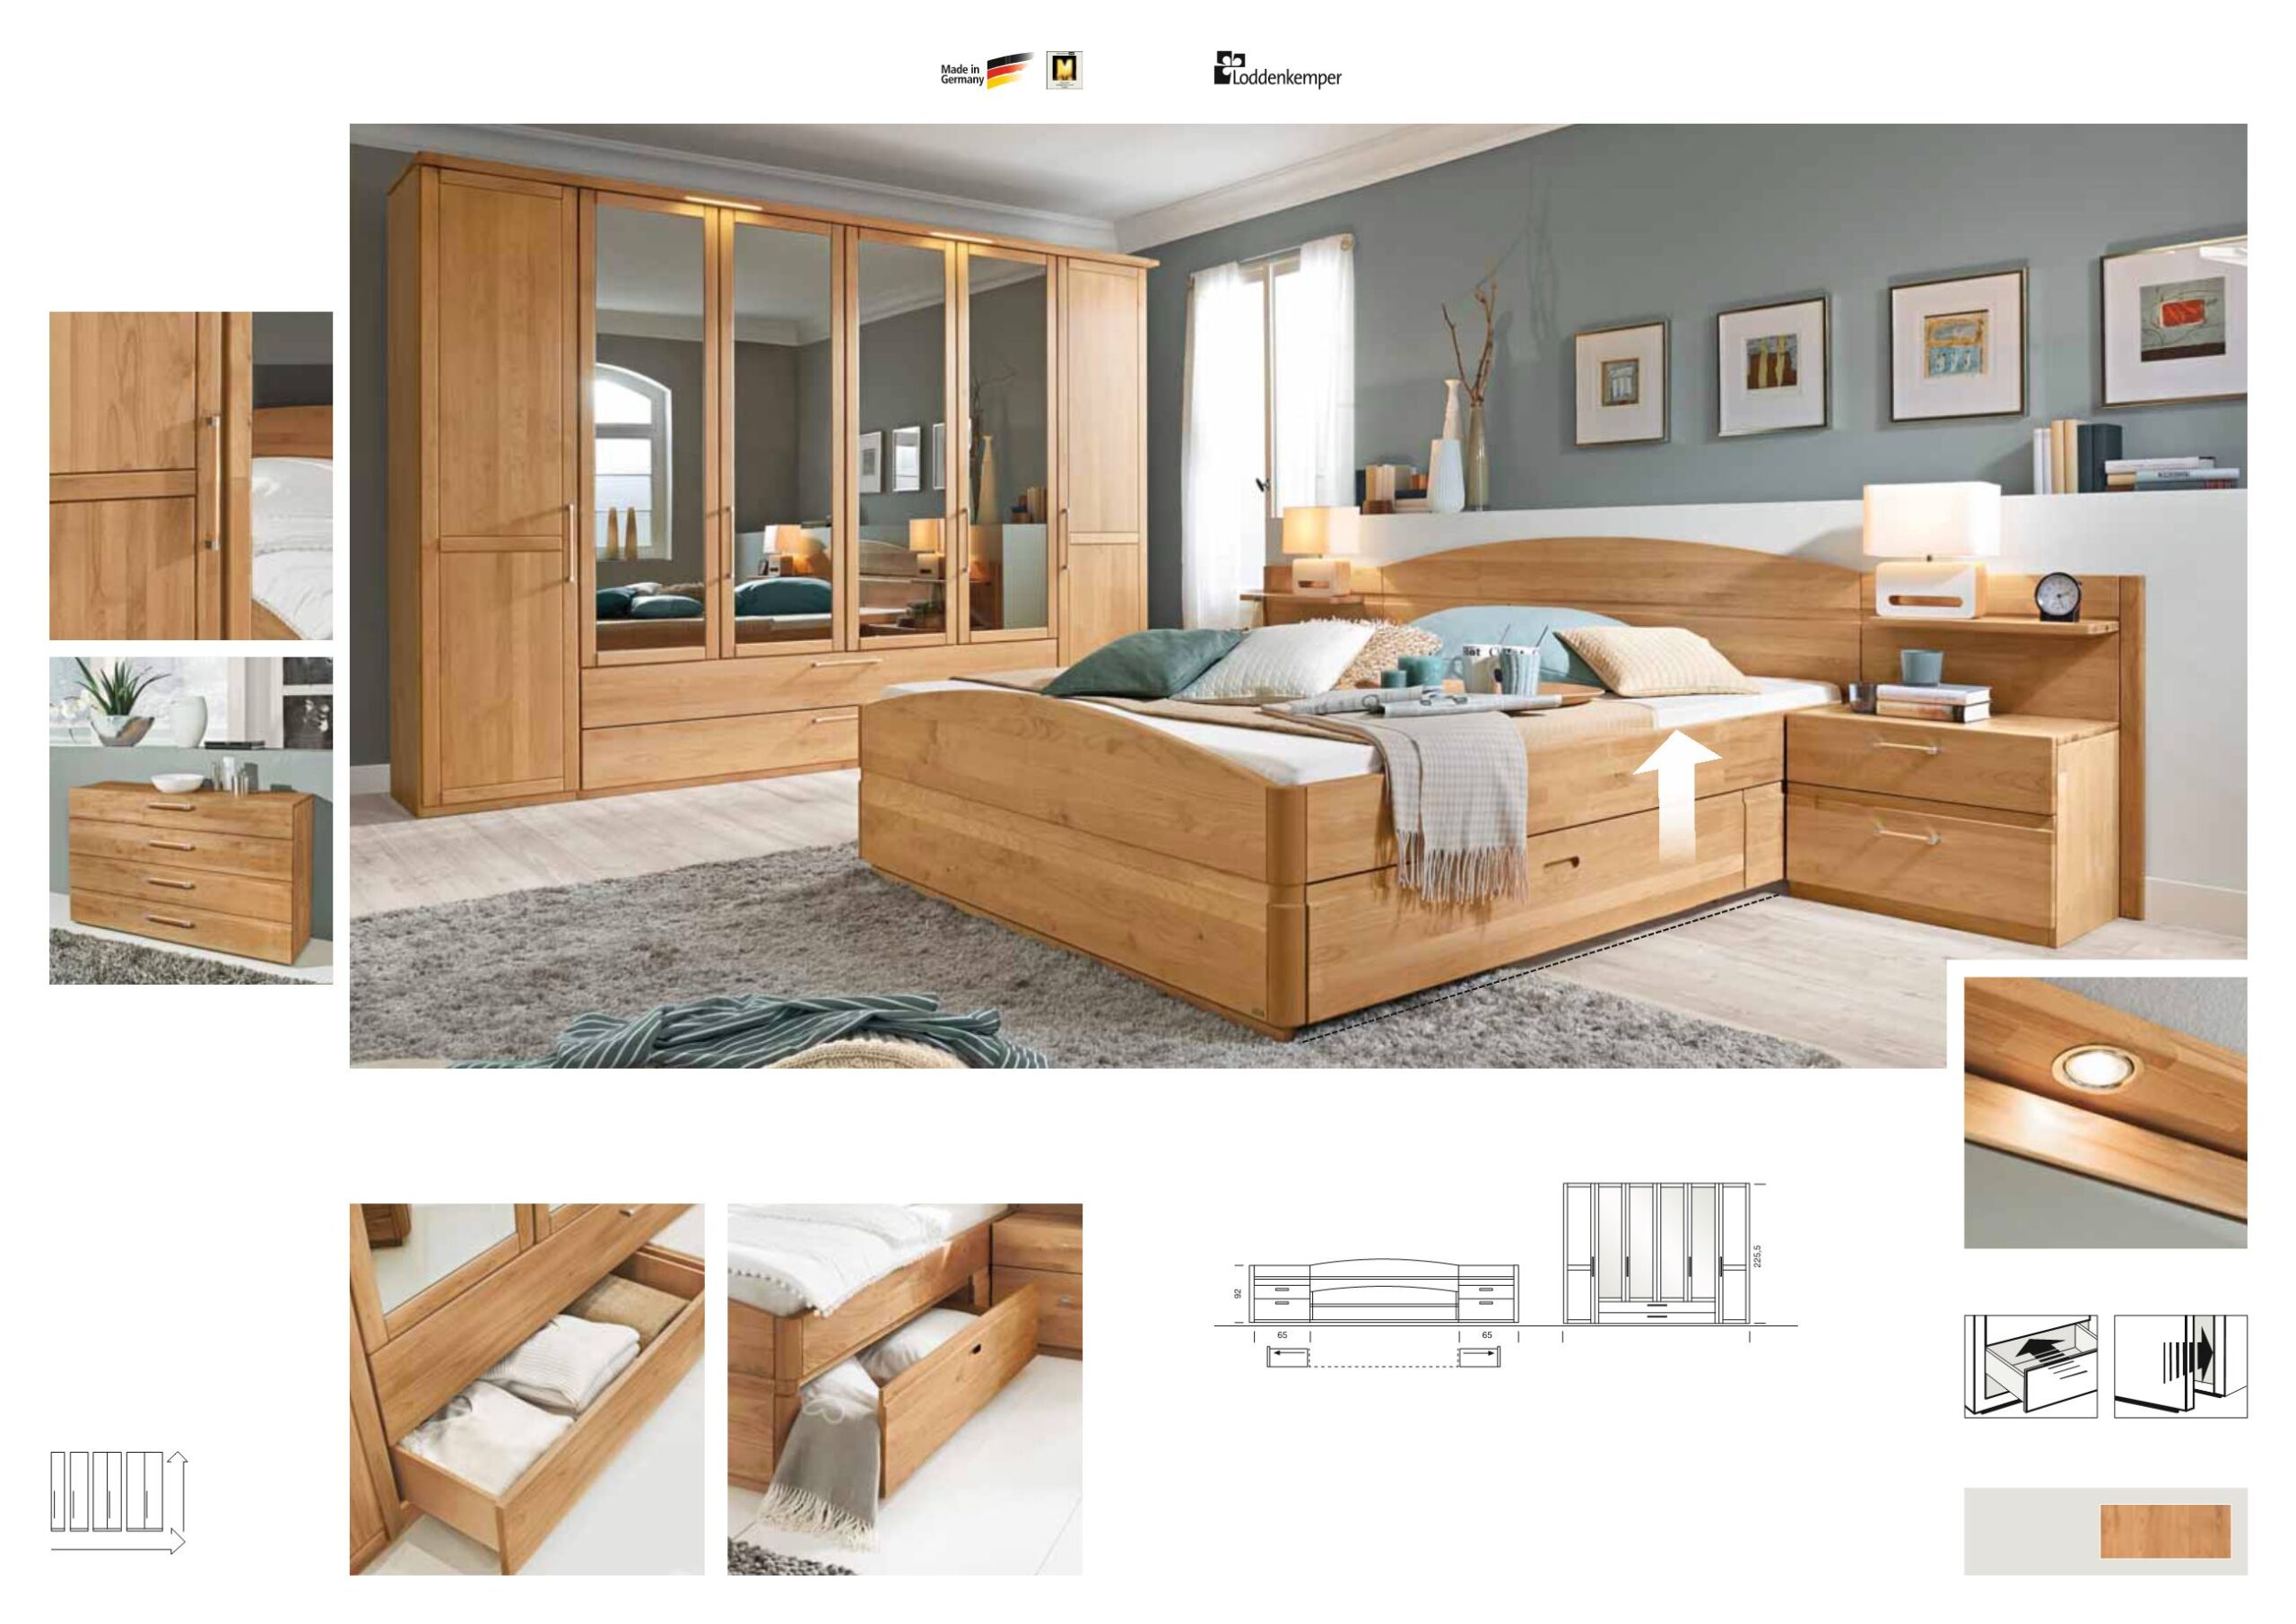 Full Size of Loddenkemper Navaro Lmie Brochure 2014 Schlafzimmer Wohnzimmer Loddenkemper Navaro